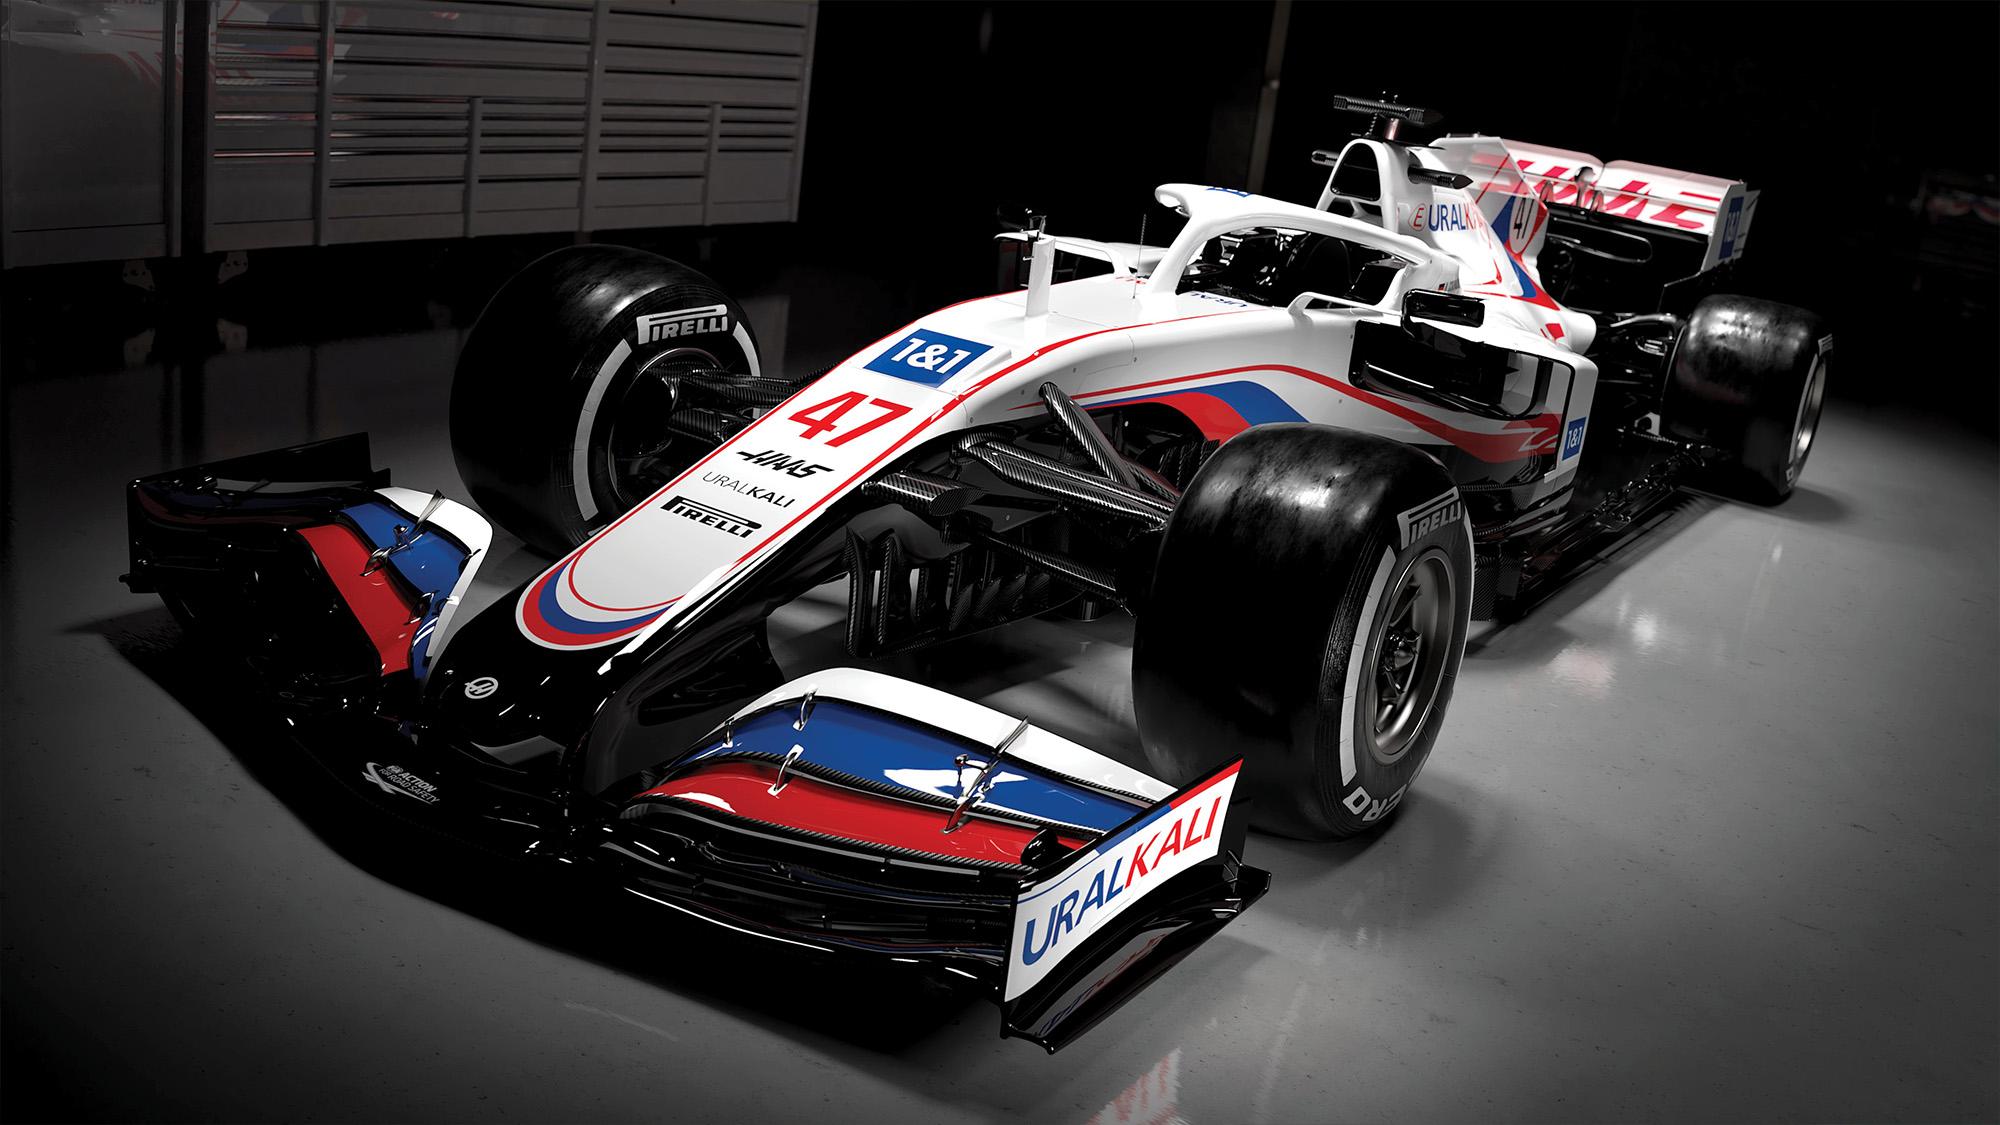 Haas 2021 livery